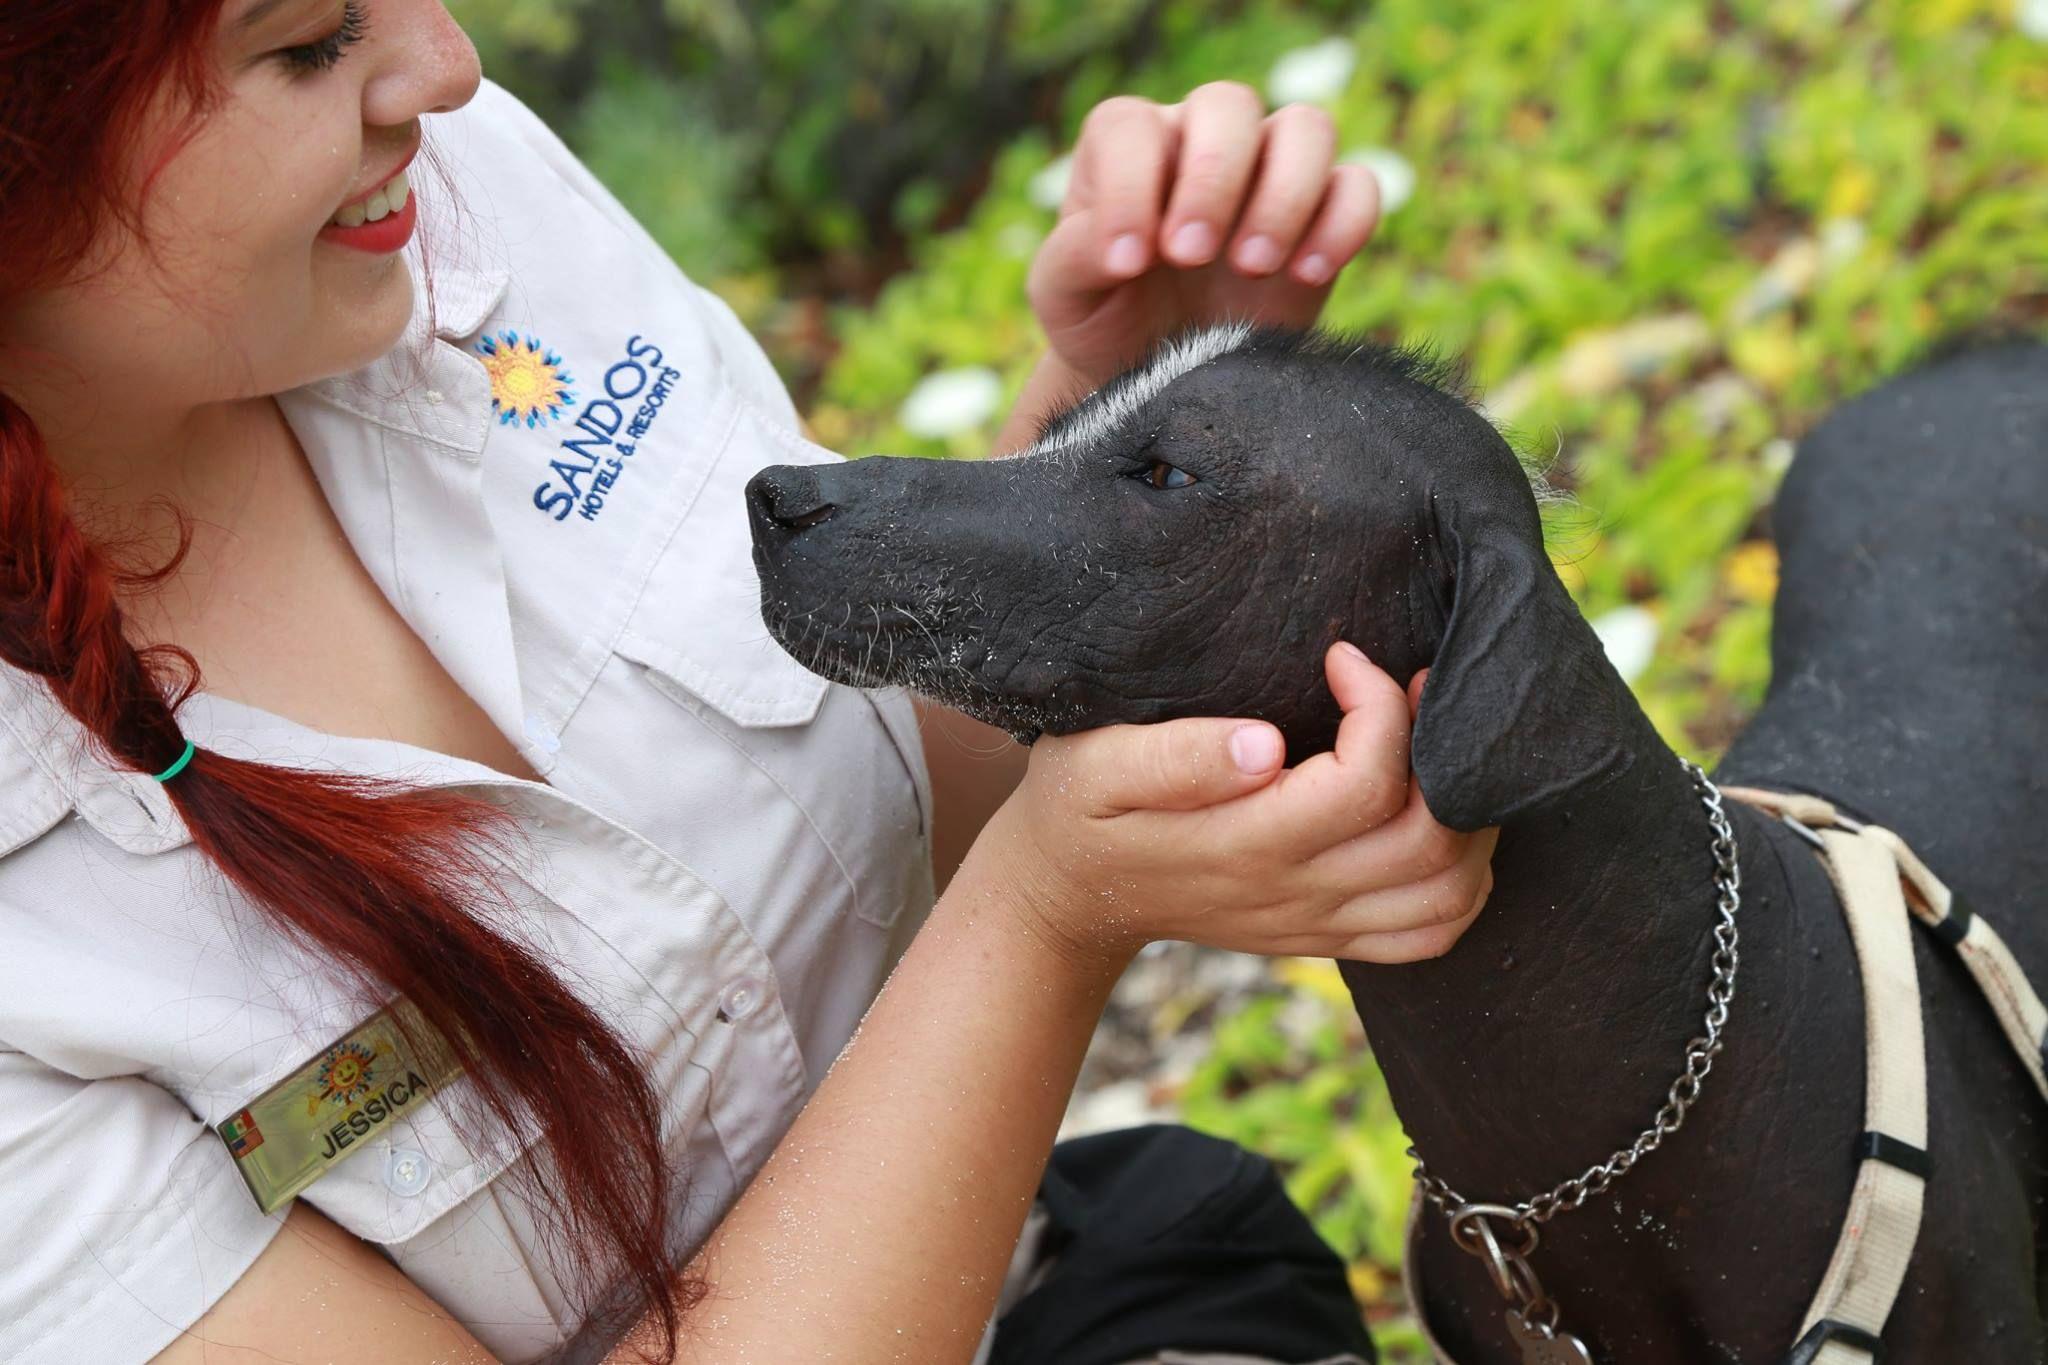 This #InternationalGuideDogsDay we'd like to introduce to you Box, 1 of the 3 prehispanic dogs we have at the resort.  Este #DíaInternacionaldePerrosGuía te presentamos a Box, uno de lo 3 perros prehispánicos de Sandos Caracol.